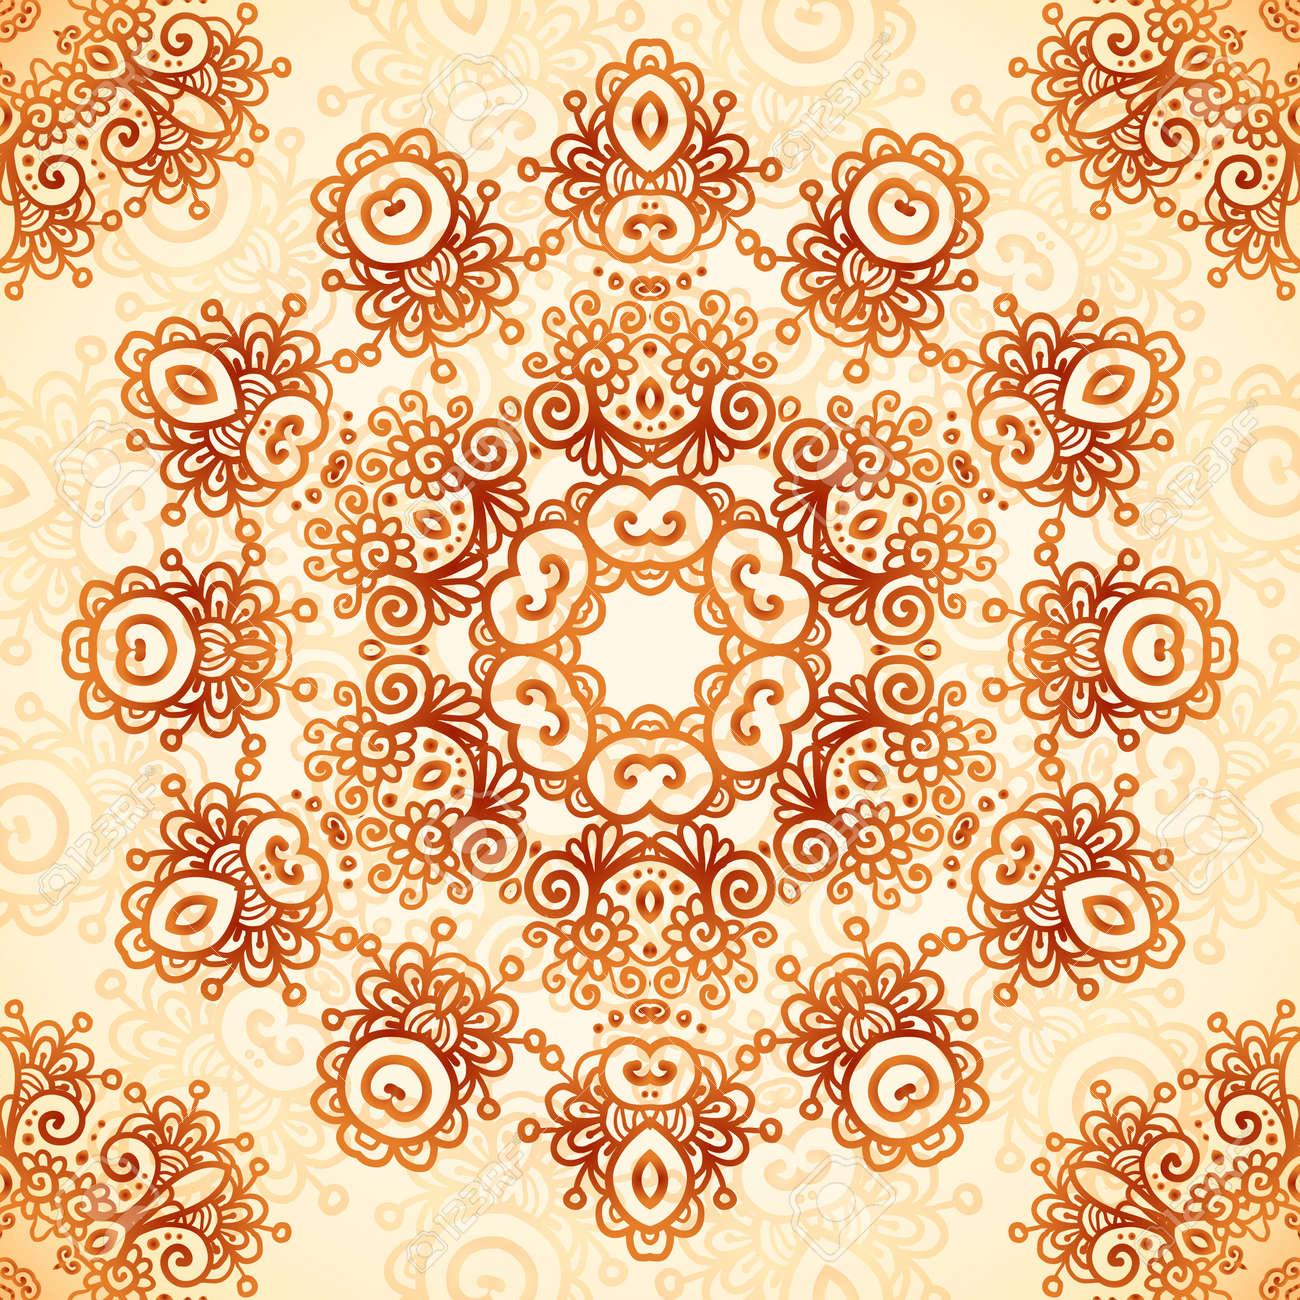 Ornate vintage vector background in mehndi style royalty free stock - Ornate Vintage Circle Vector Seamless Pattern In Mehndi Style Stock Vector 25747795